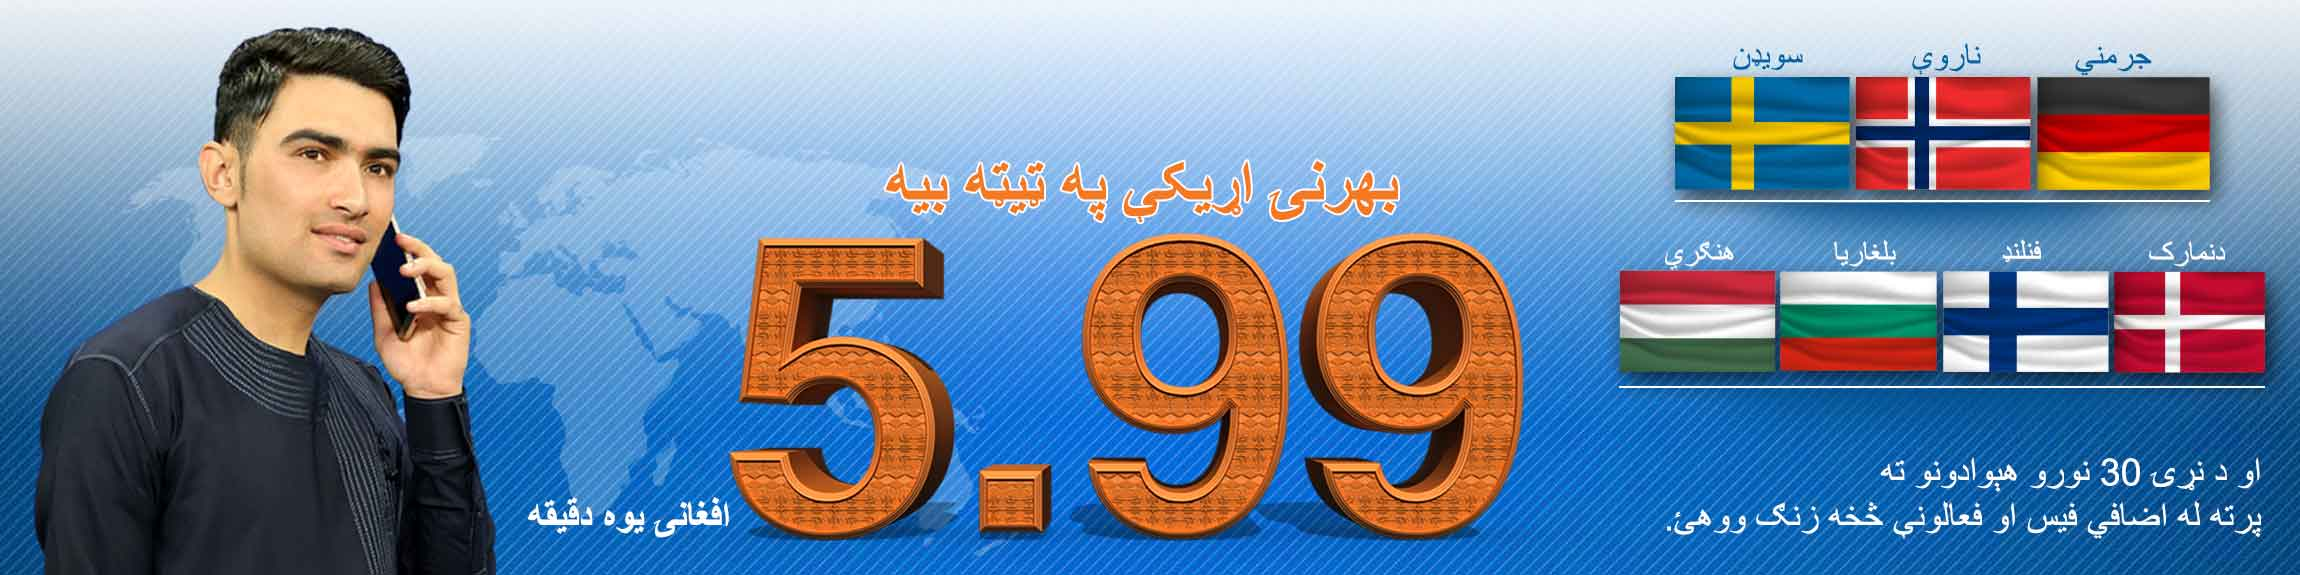 icr-pashto-website